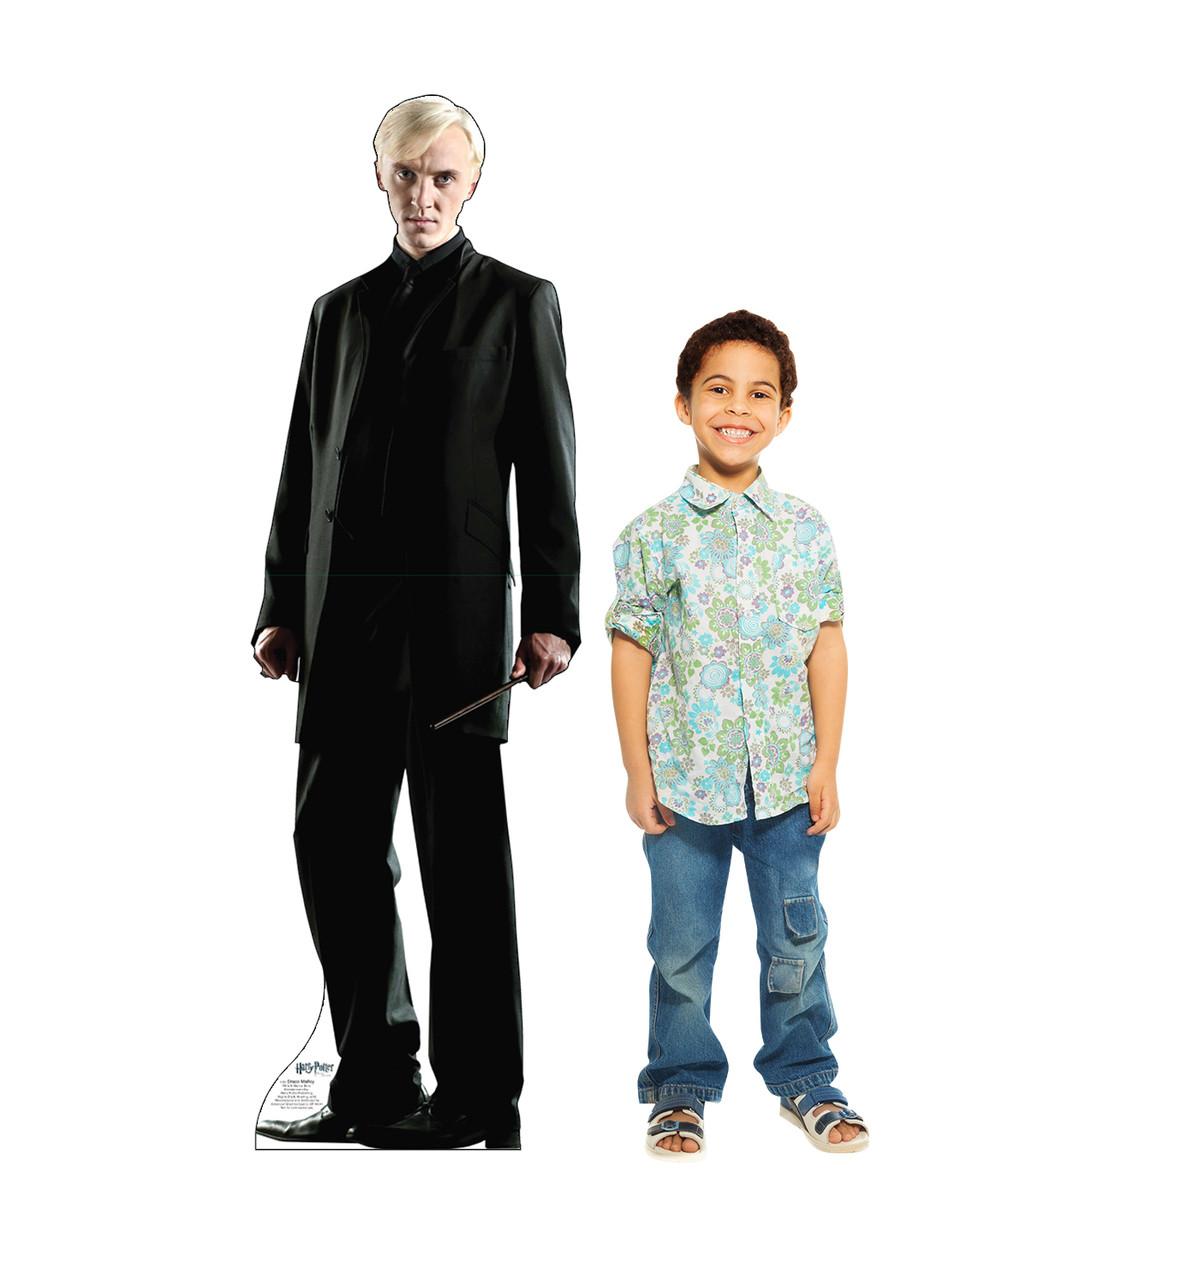 Life-size Draco Malfoy Cardboard Standup | Cardboard Cutout